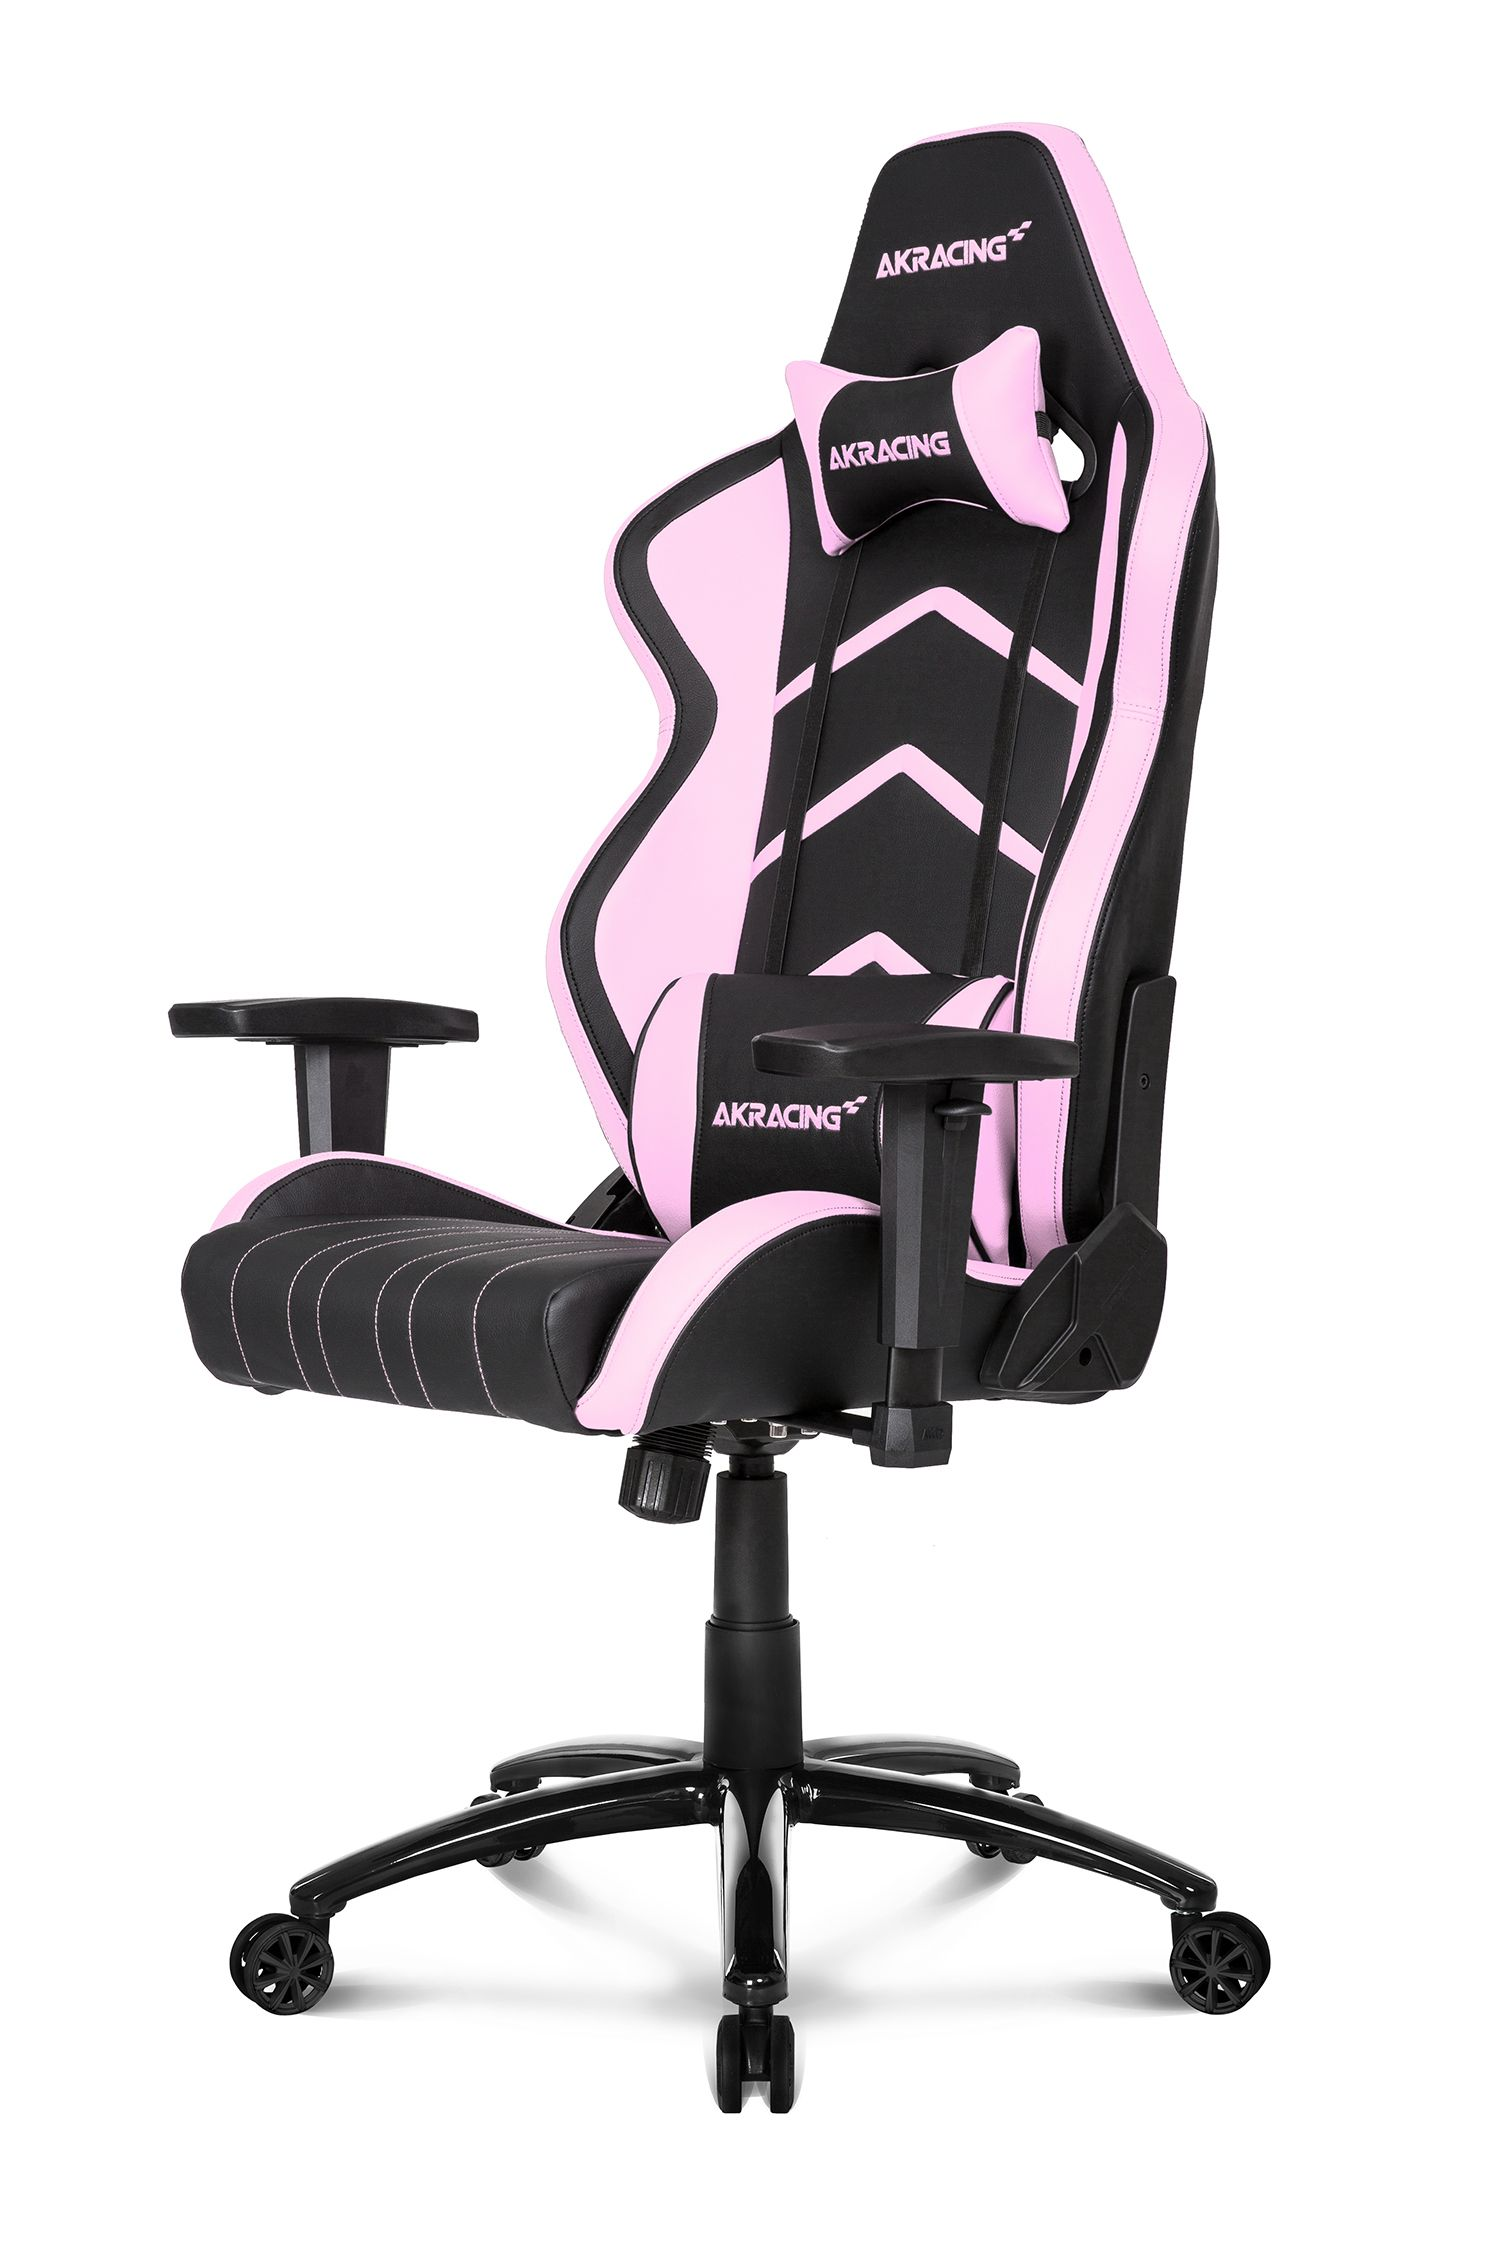 Akracing Player Gaming Chair Pink Akracing Gaming Chair Gamer Chair Game Room Chairs